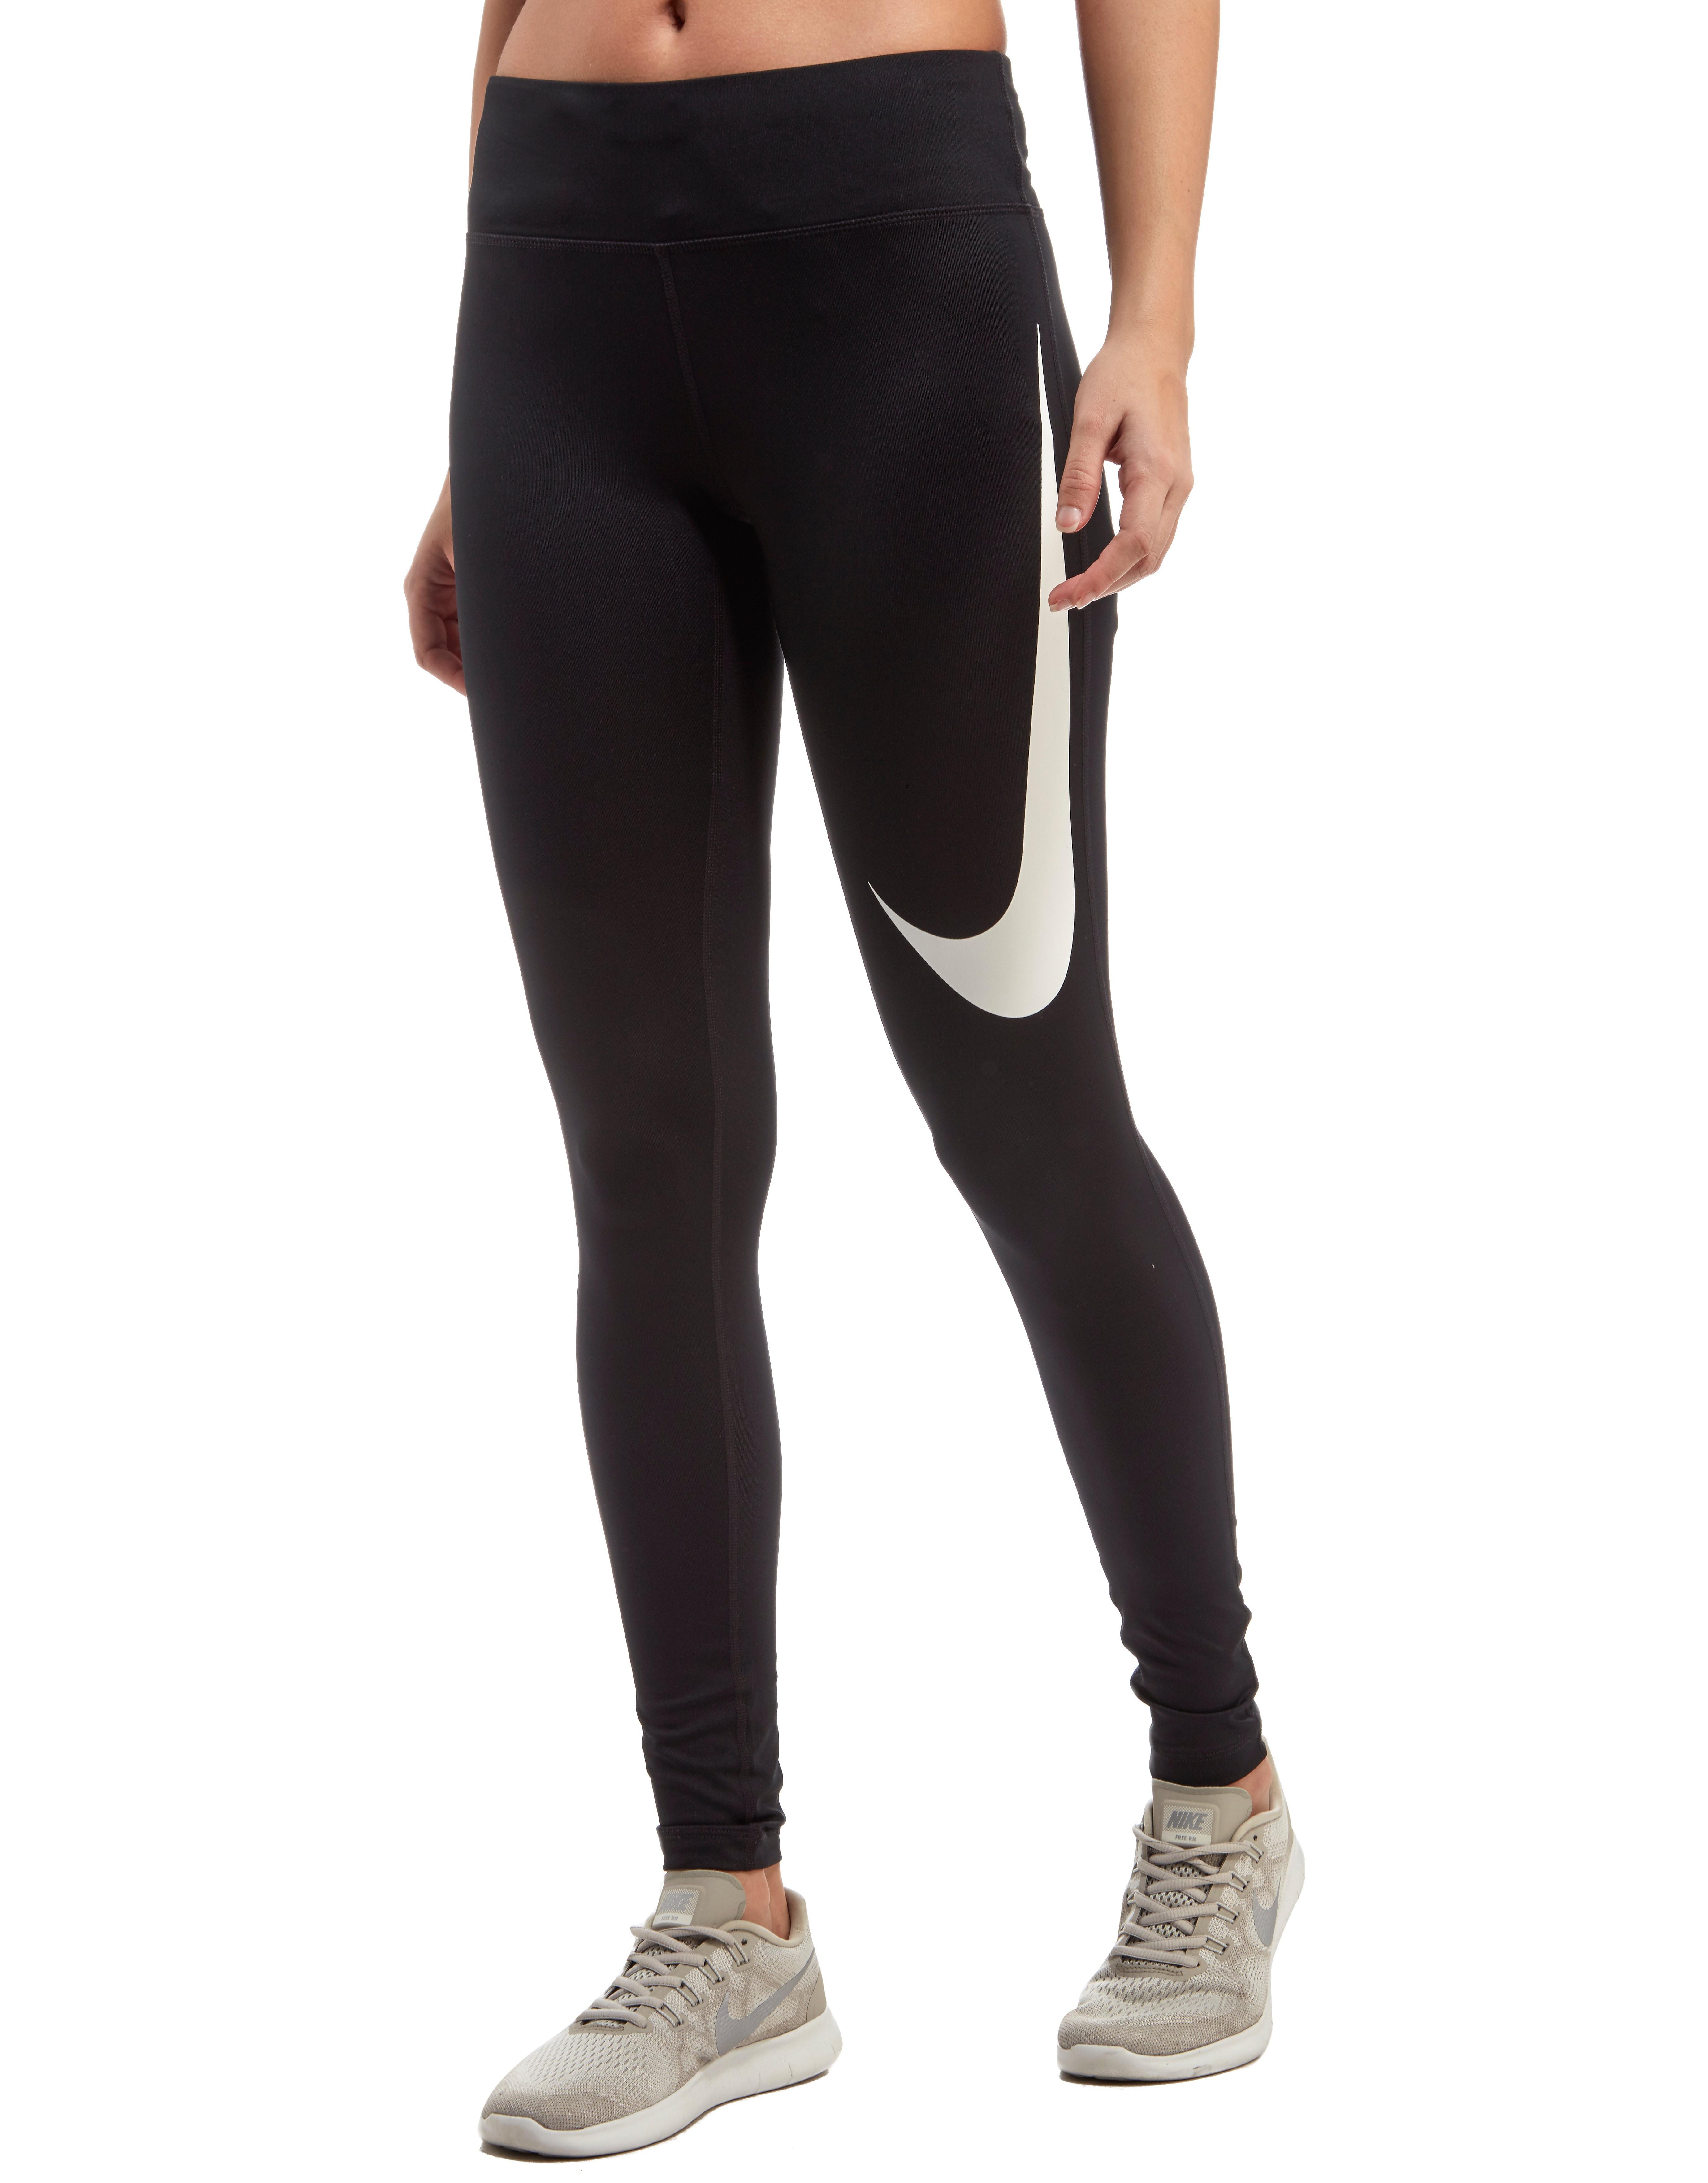 Nike Swoosh Power Essential Running Tights